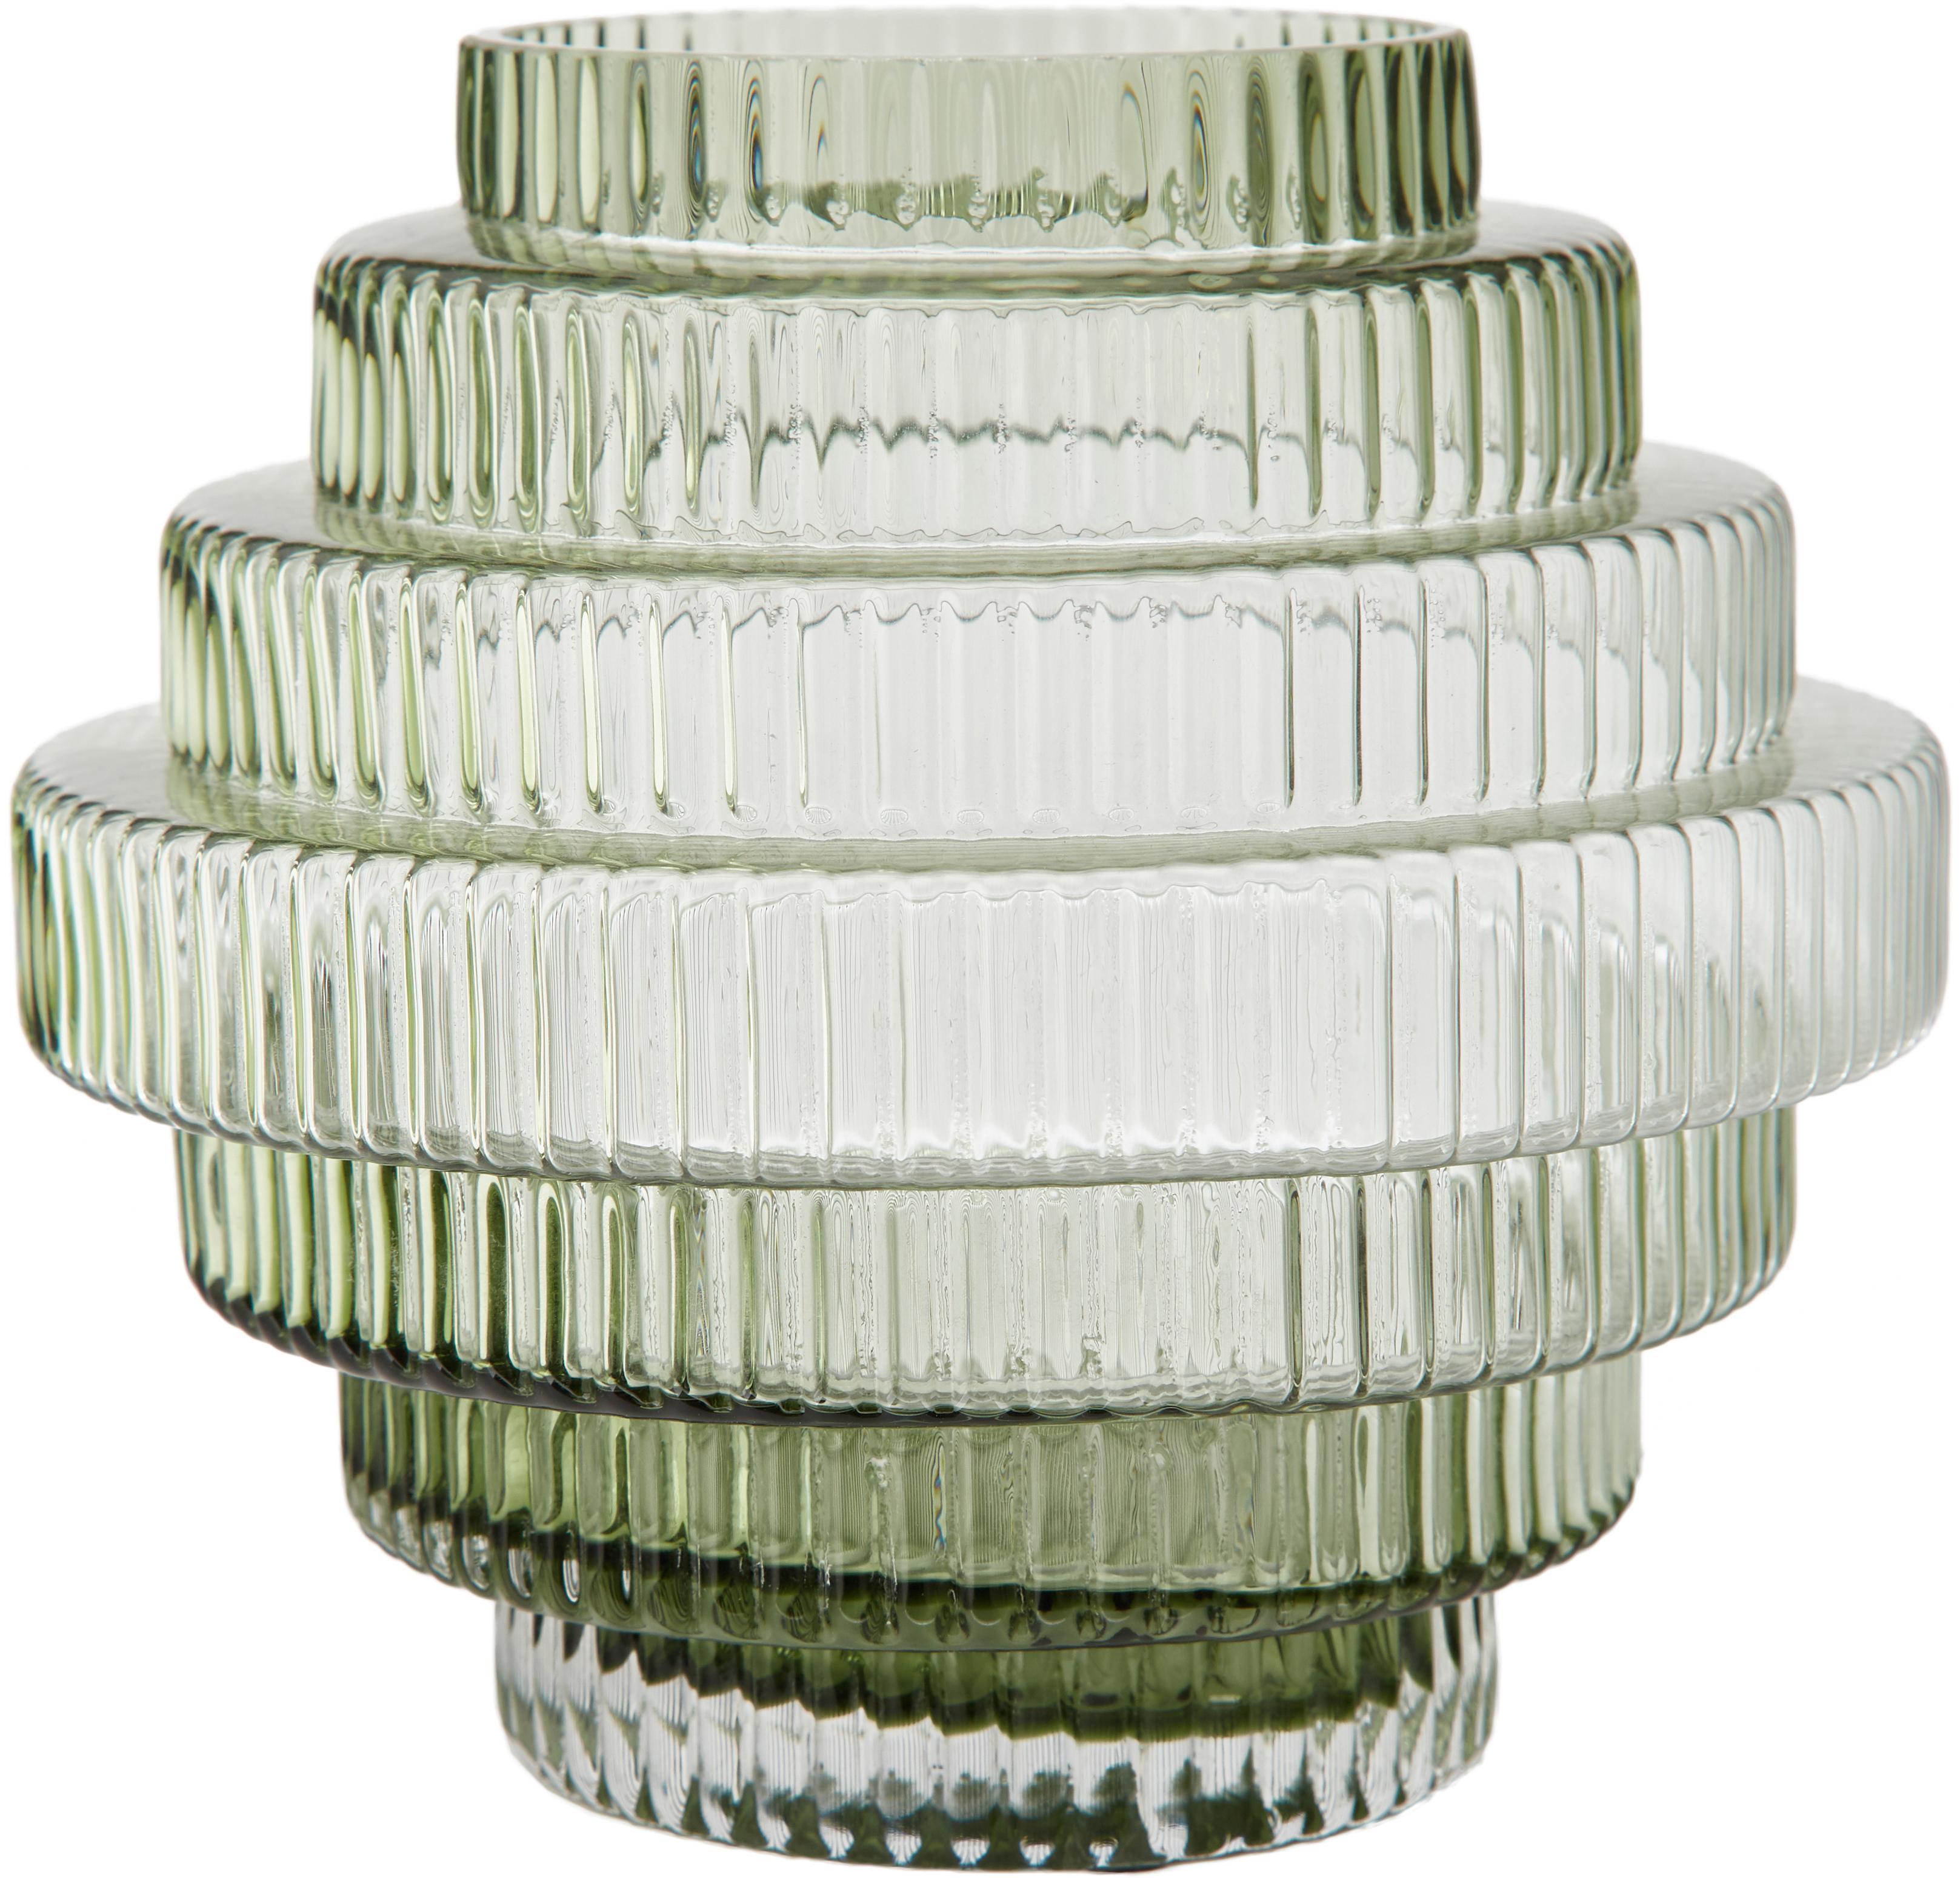 Transparante glazen vaas Rilla met een groene glans, Glas, Groen, Ø 16 x H 16 cm